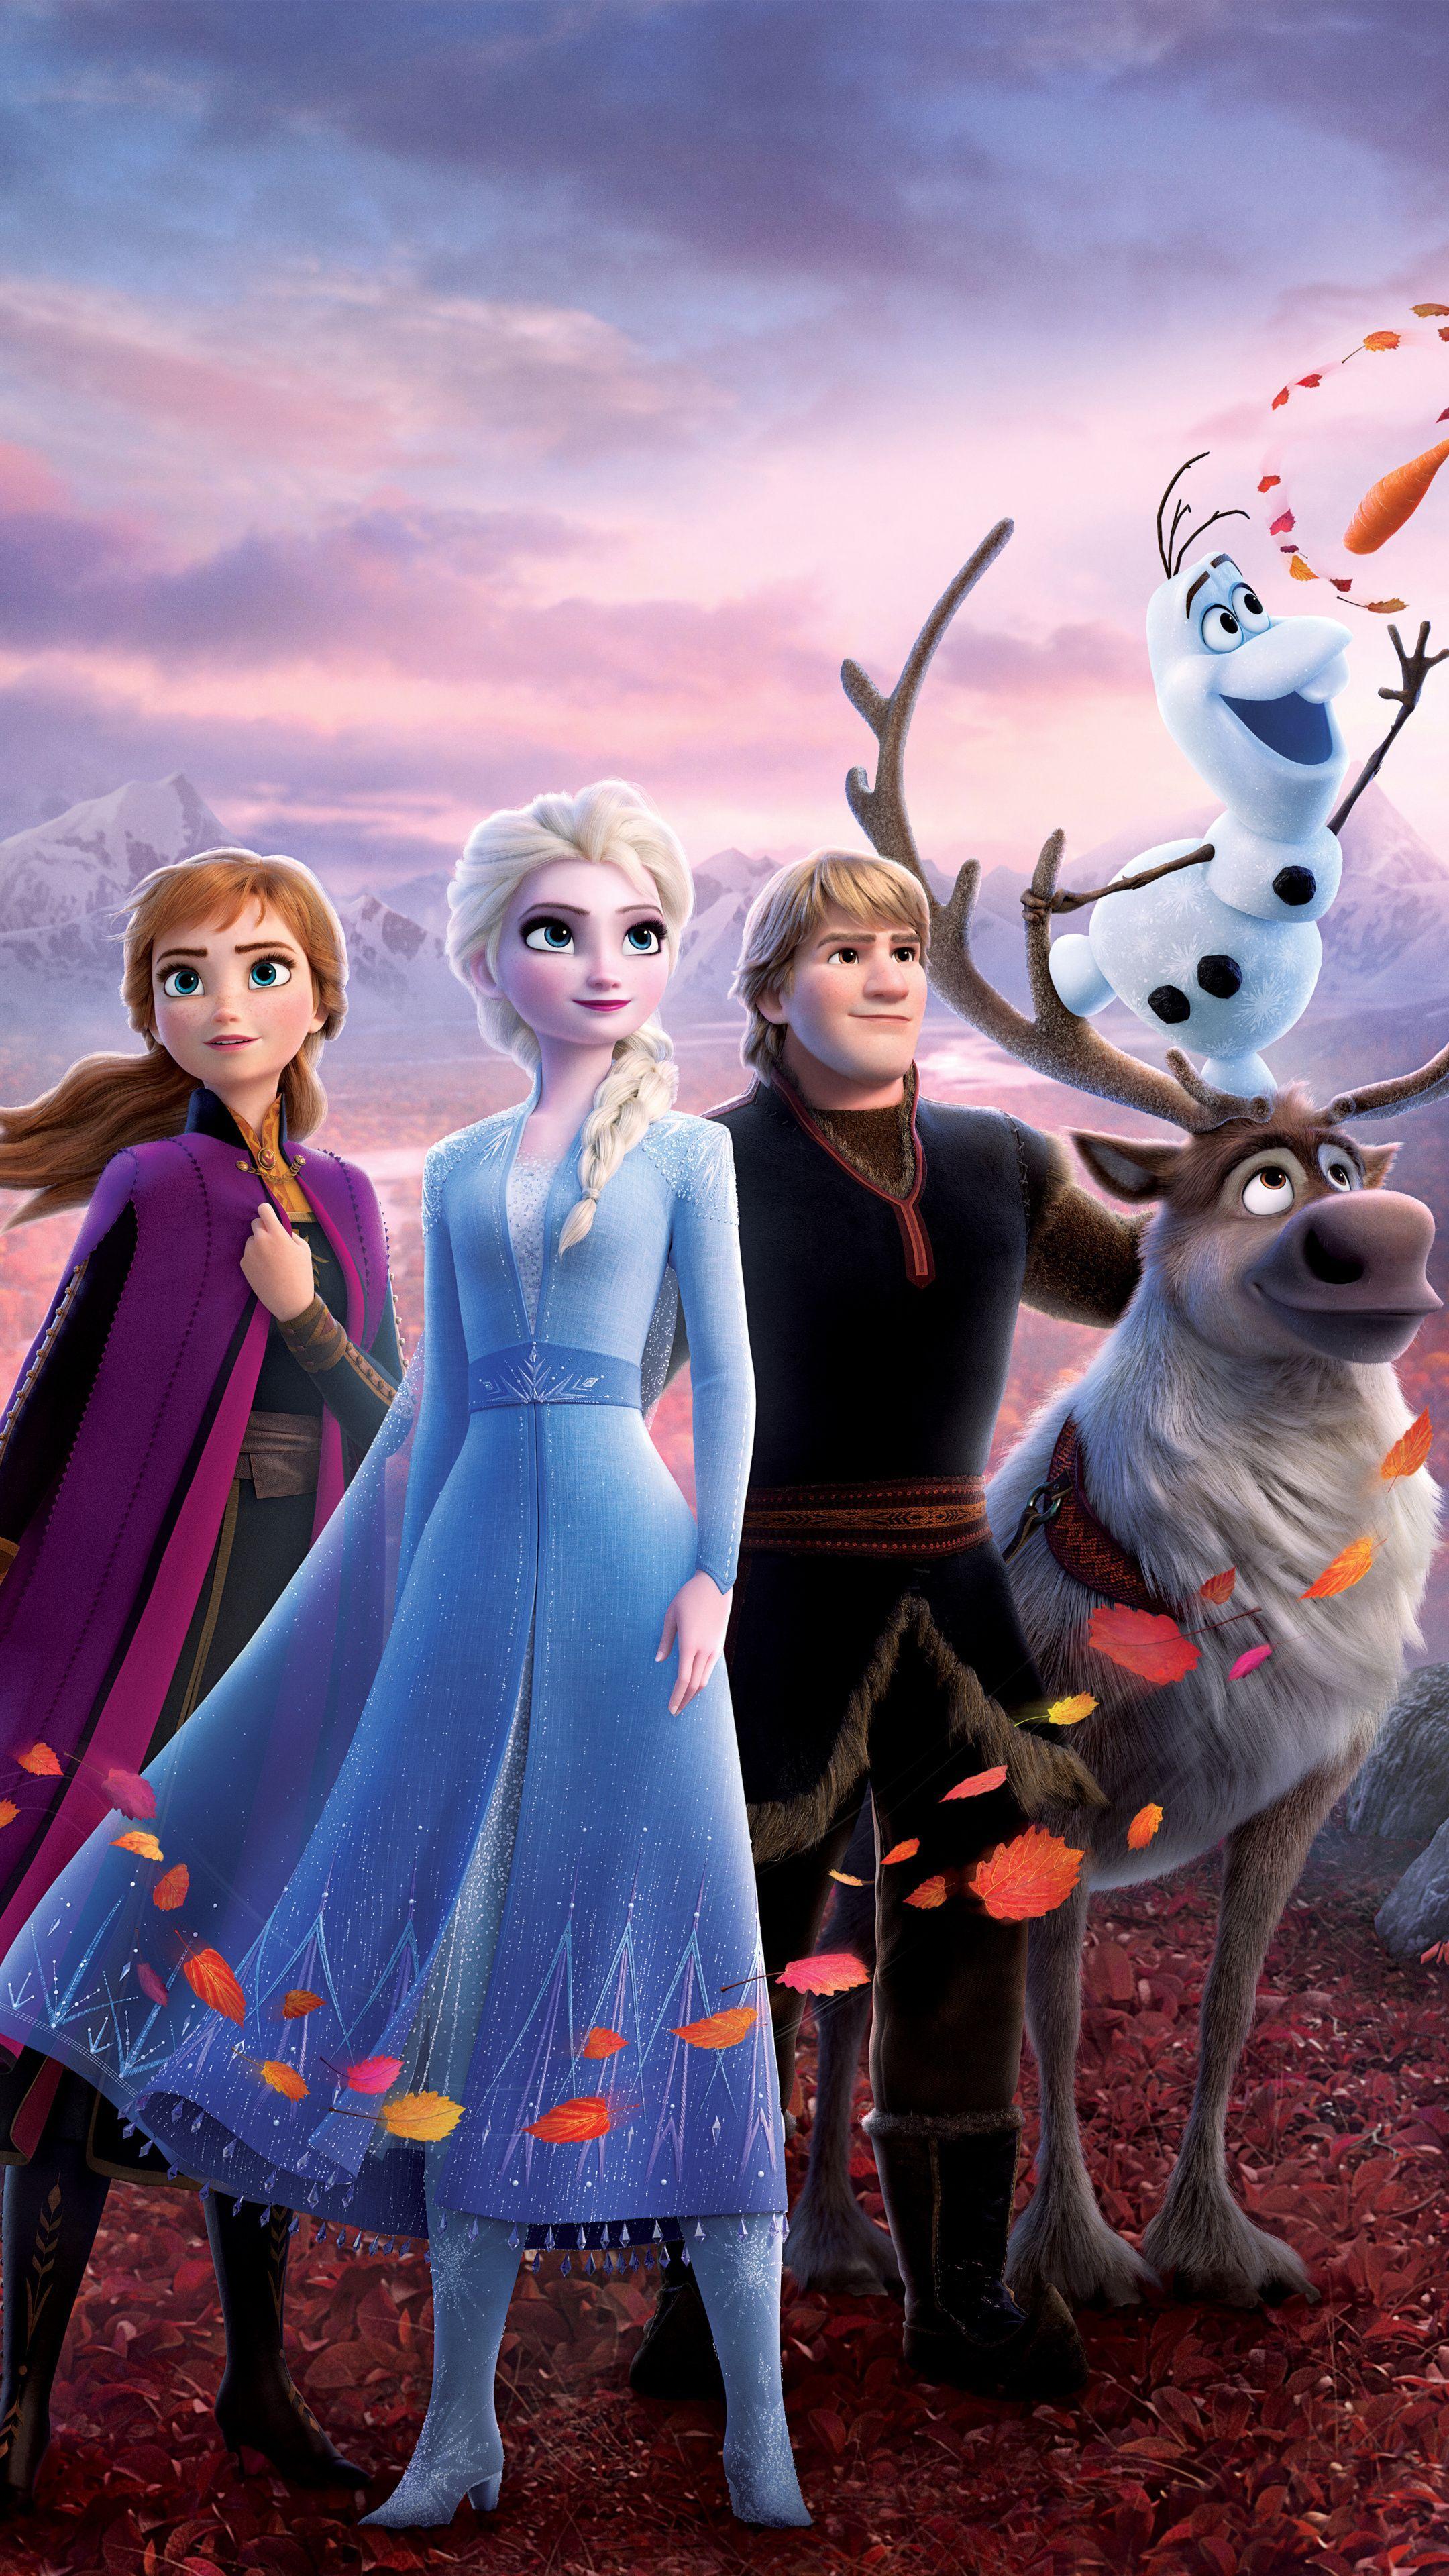 2160x3840 Pelicula Pelicula De Animacion De Disney Frozen 2 Fondo De Pantalla De Herman Disney Frozen Elsa Art Frozen Disney Movie Disney Princess Wallpaper